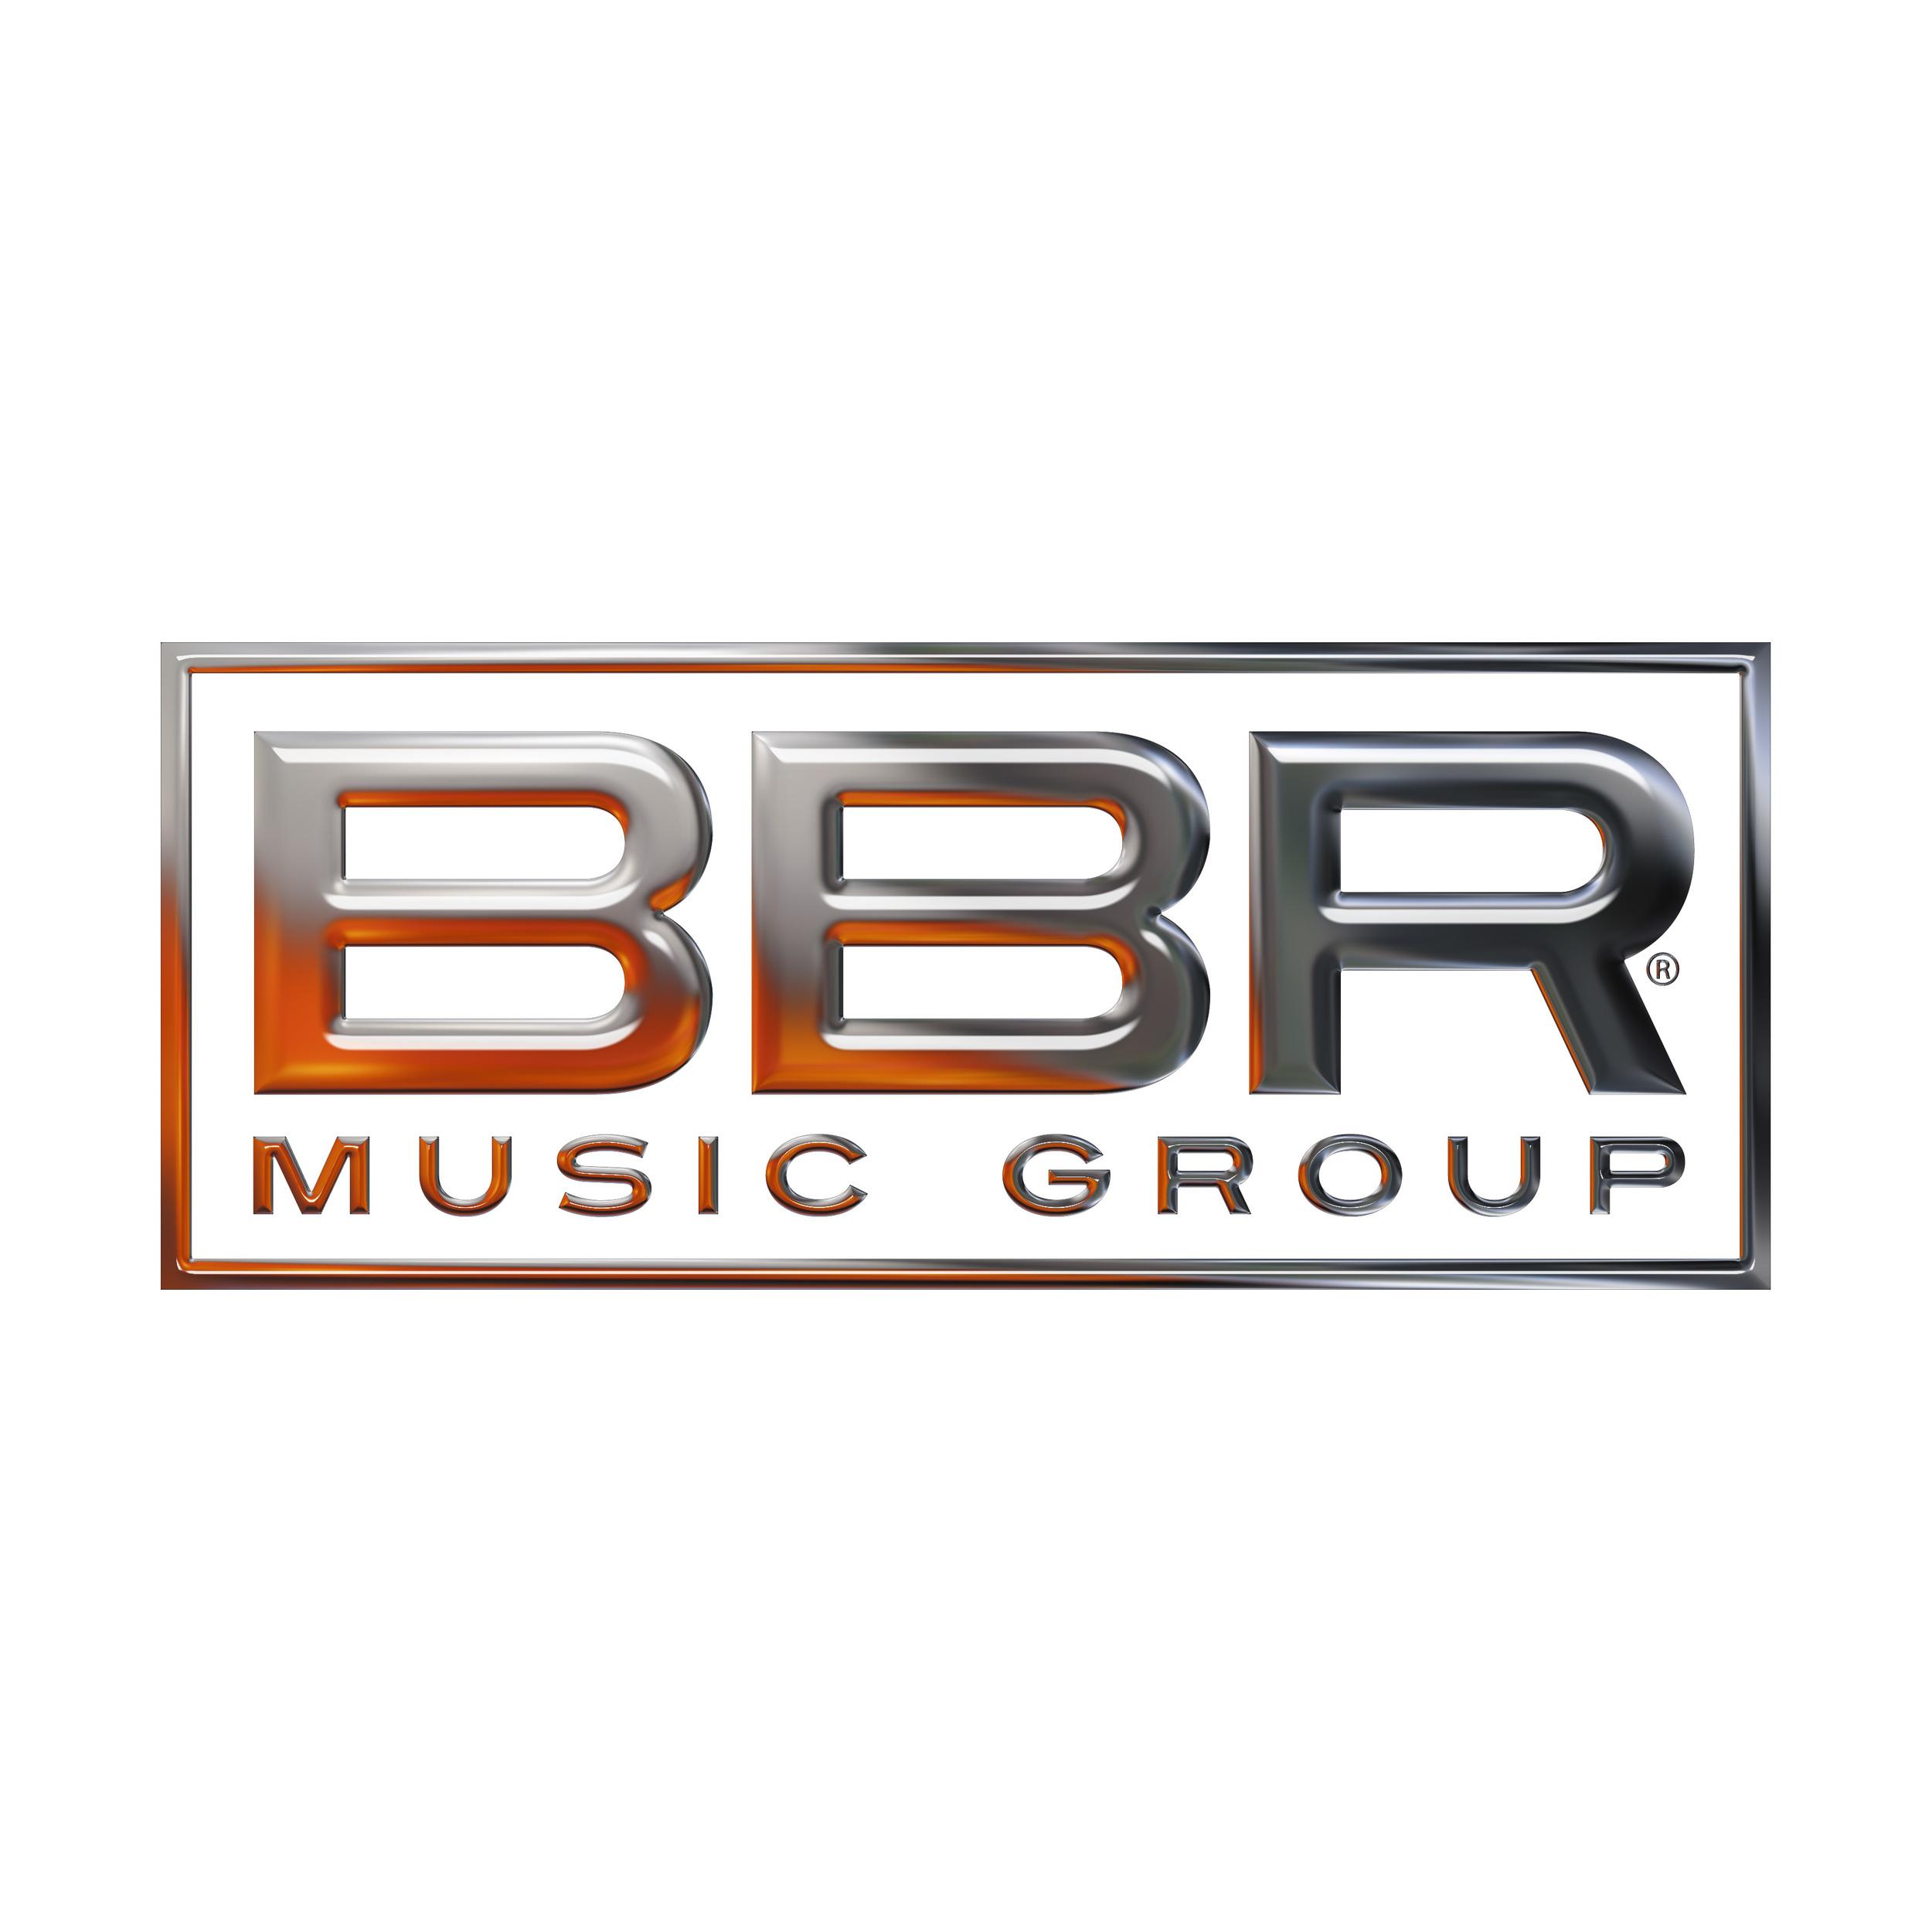 BBR MUSIC Grp Chrome logo.jpg